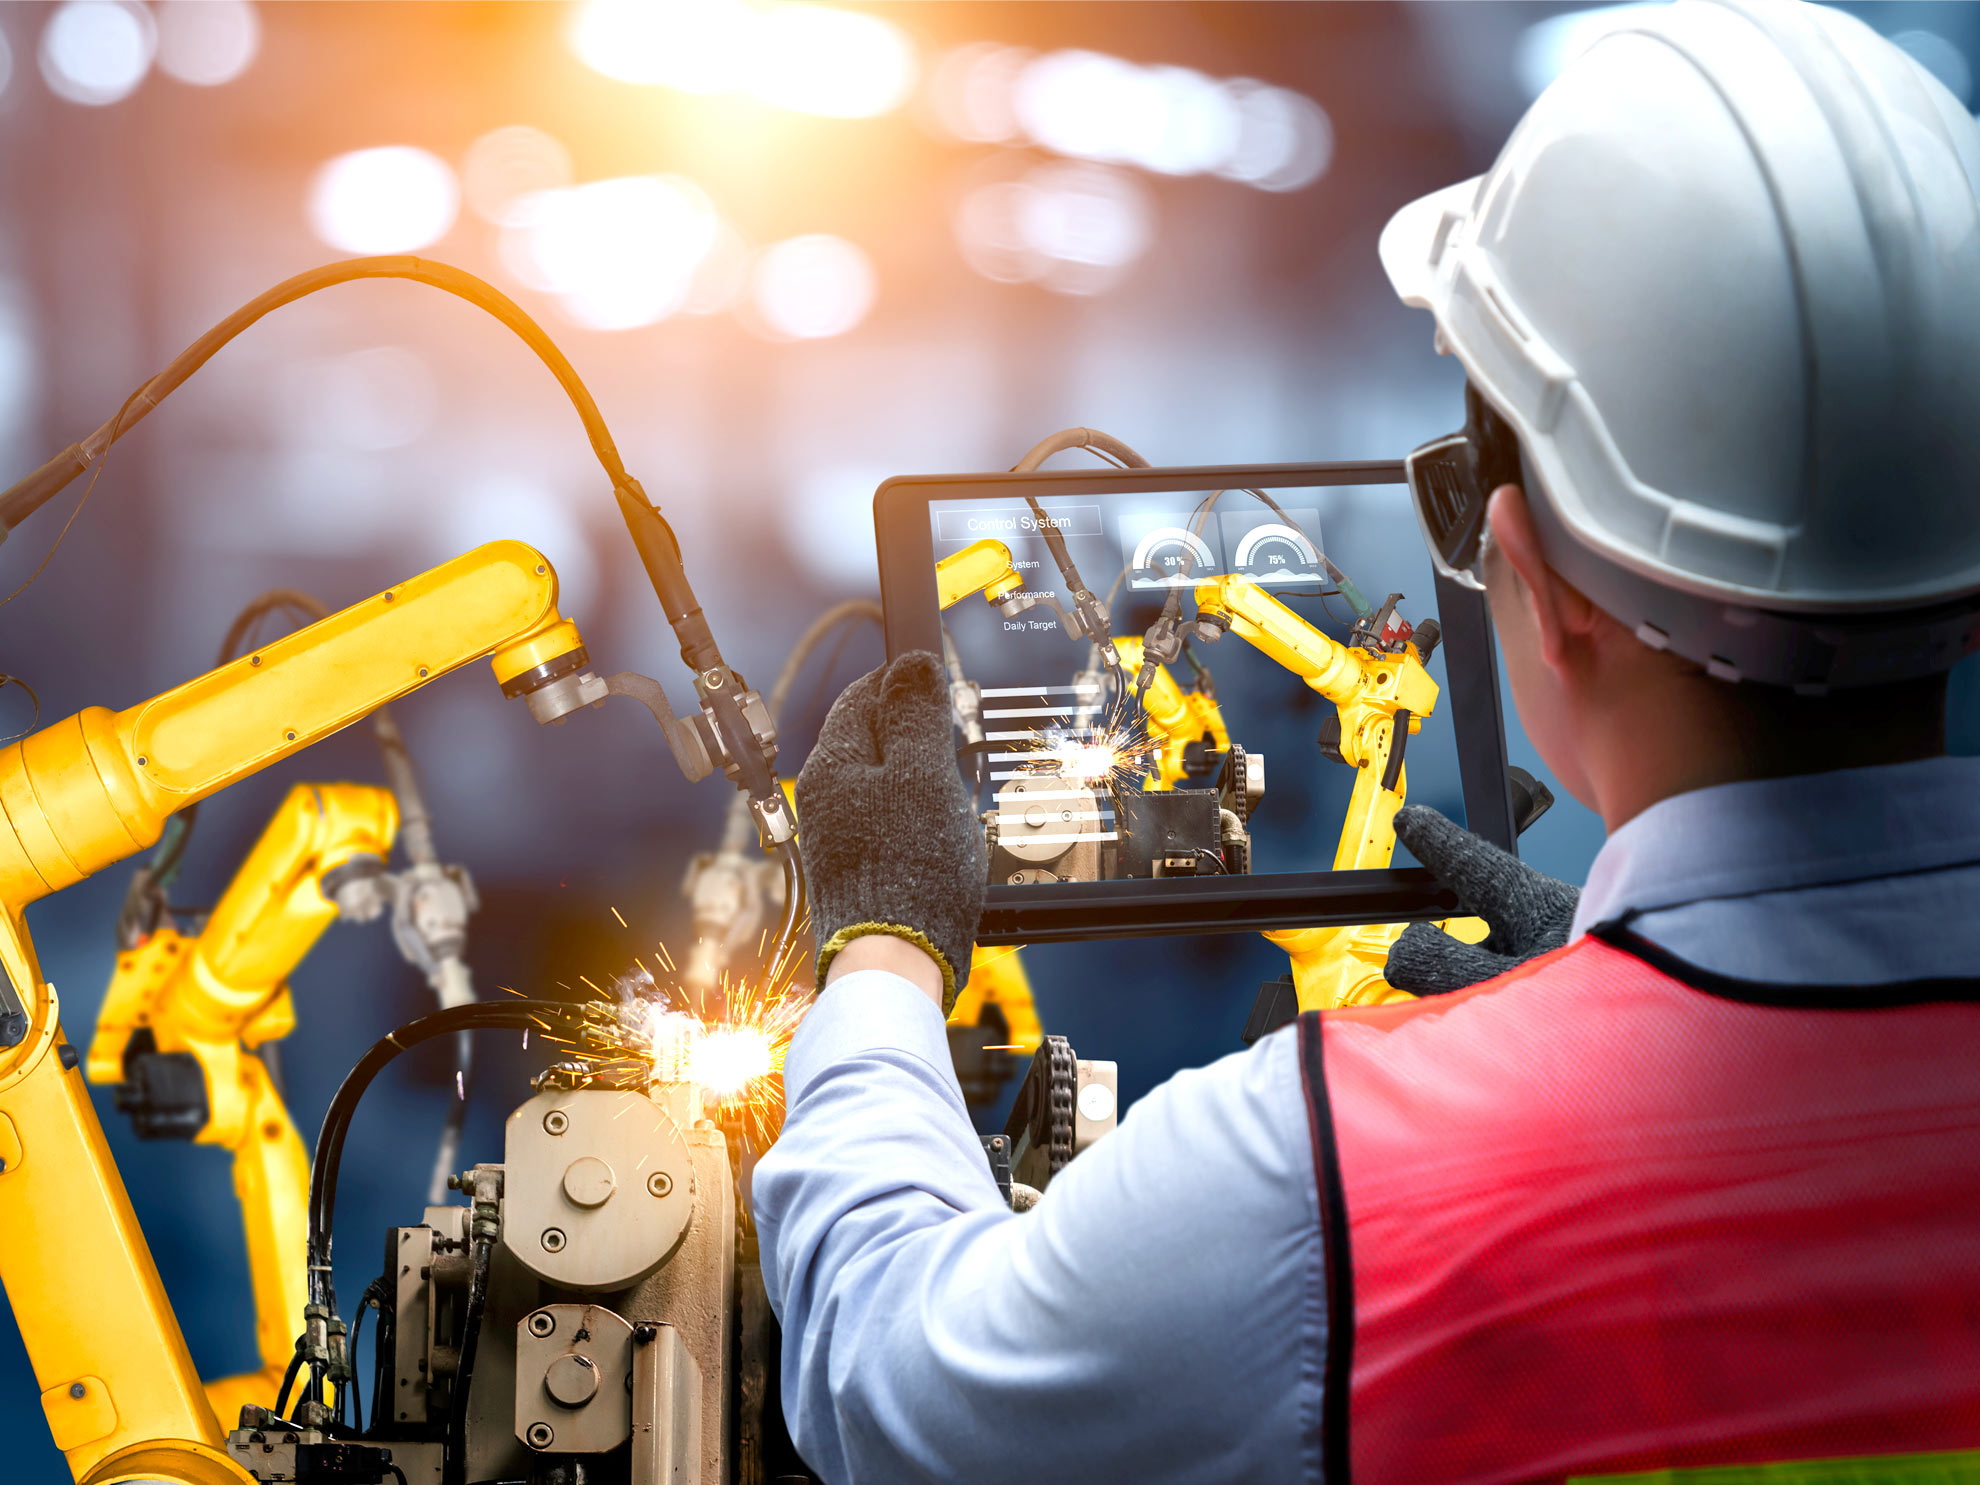 I vantaggi del software MES di produzione per la Manifattura.